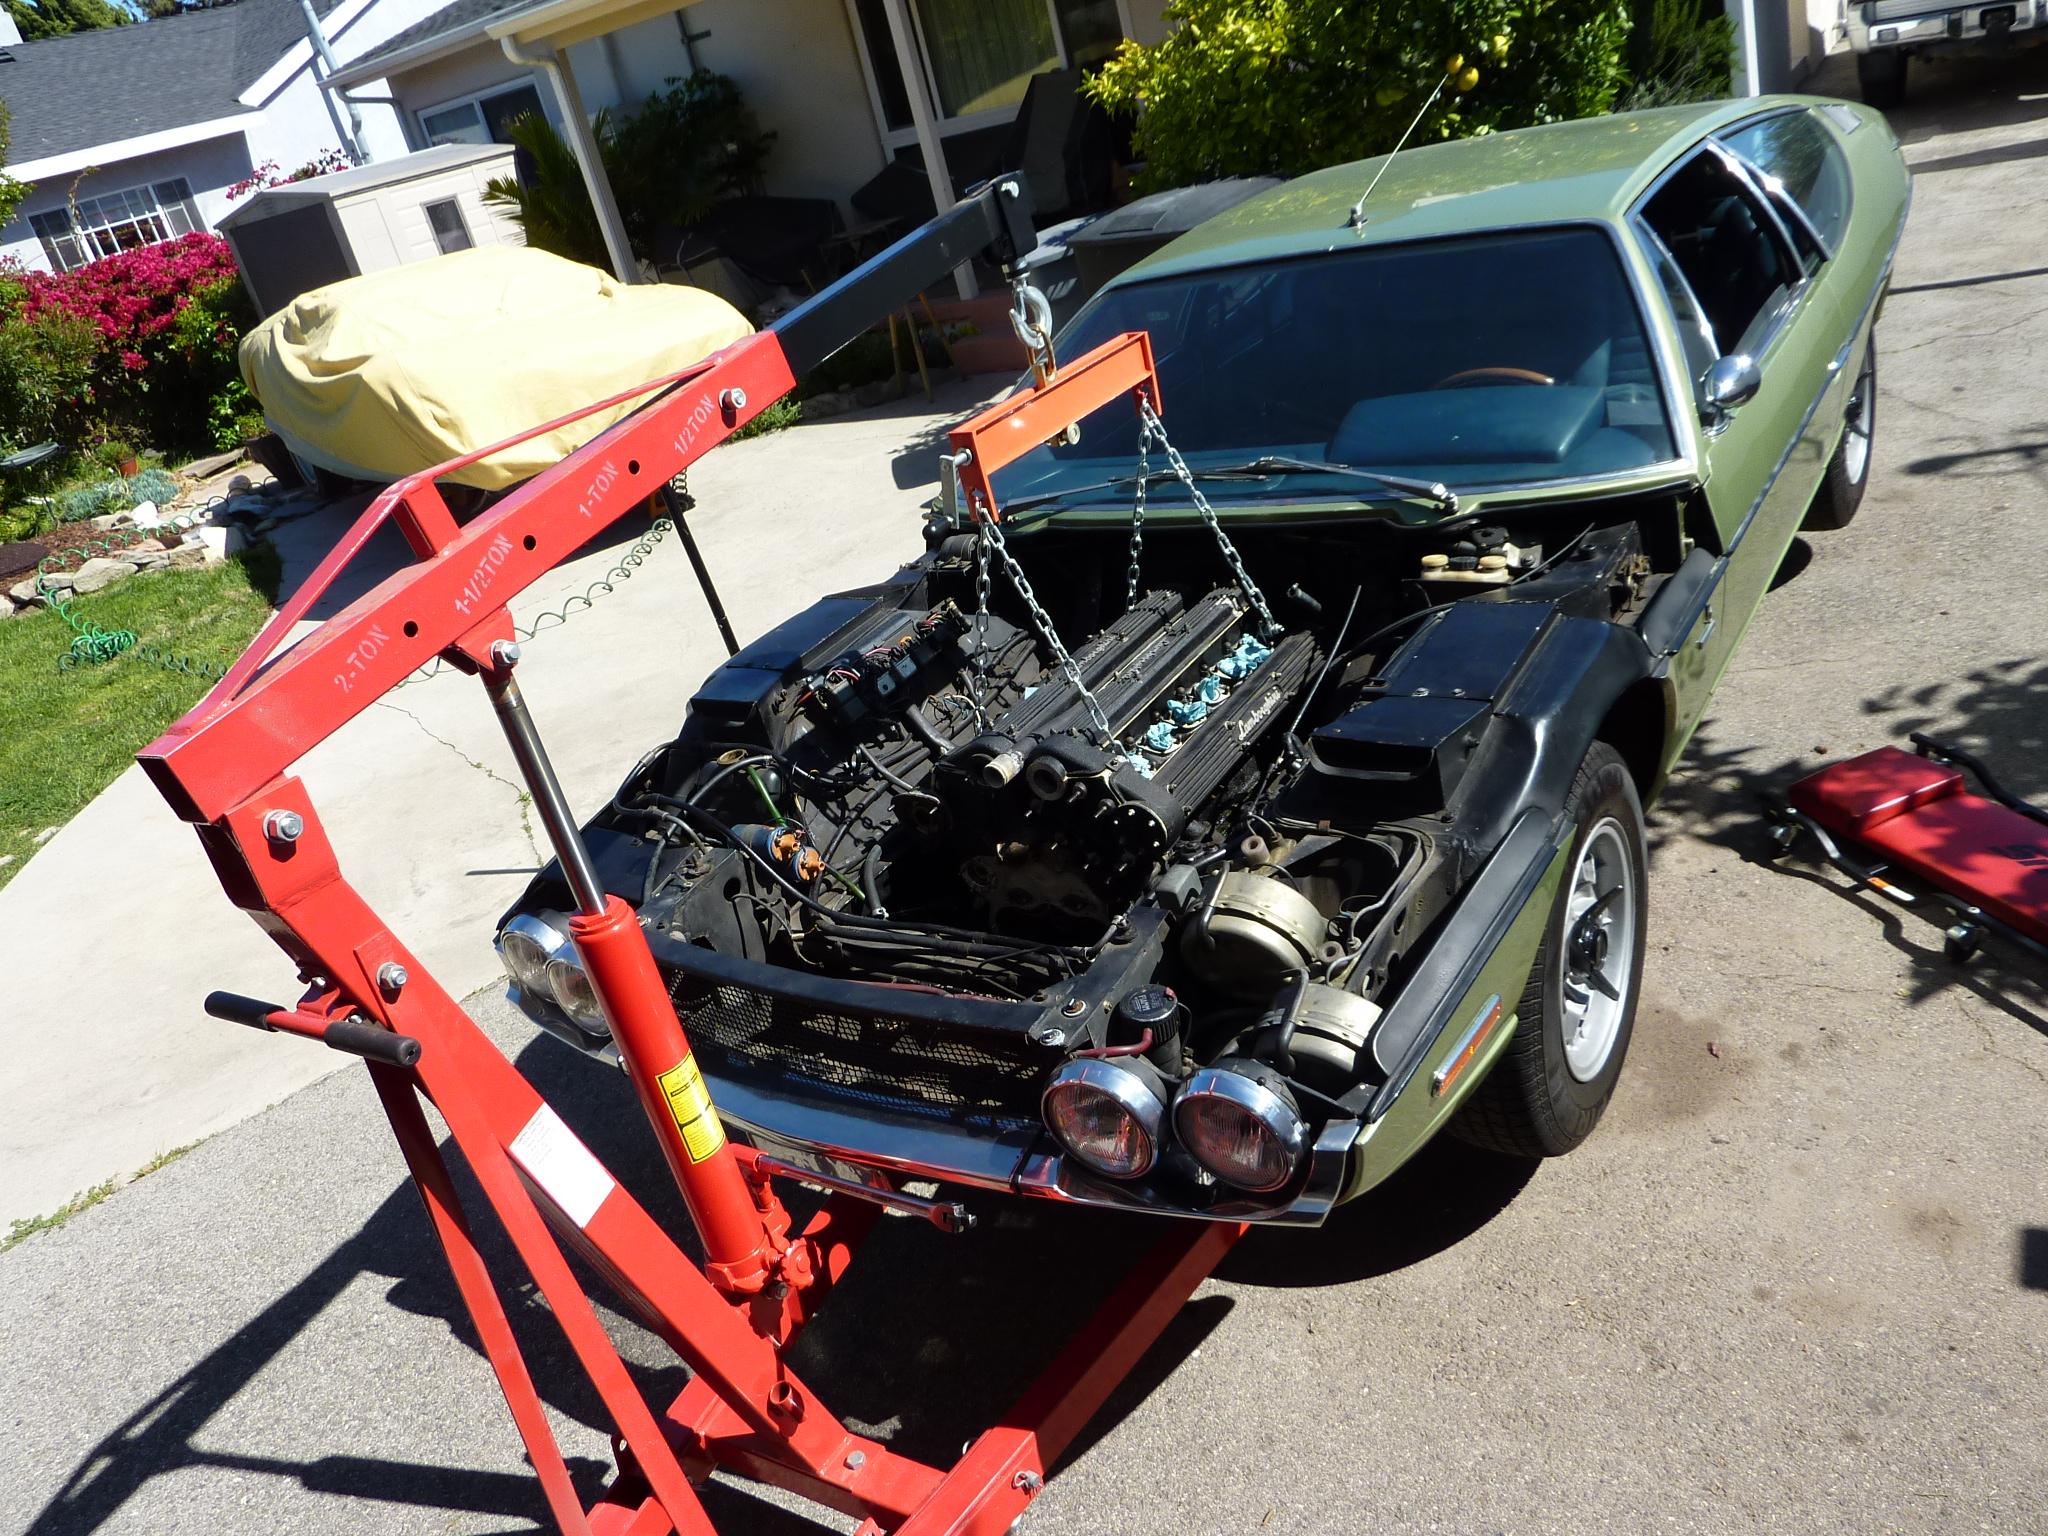 1970 Lamborghini Espada engine work